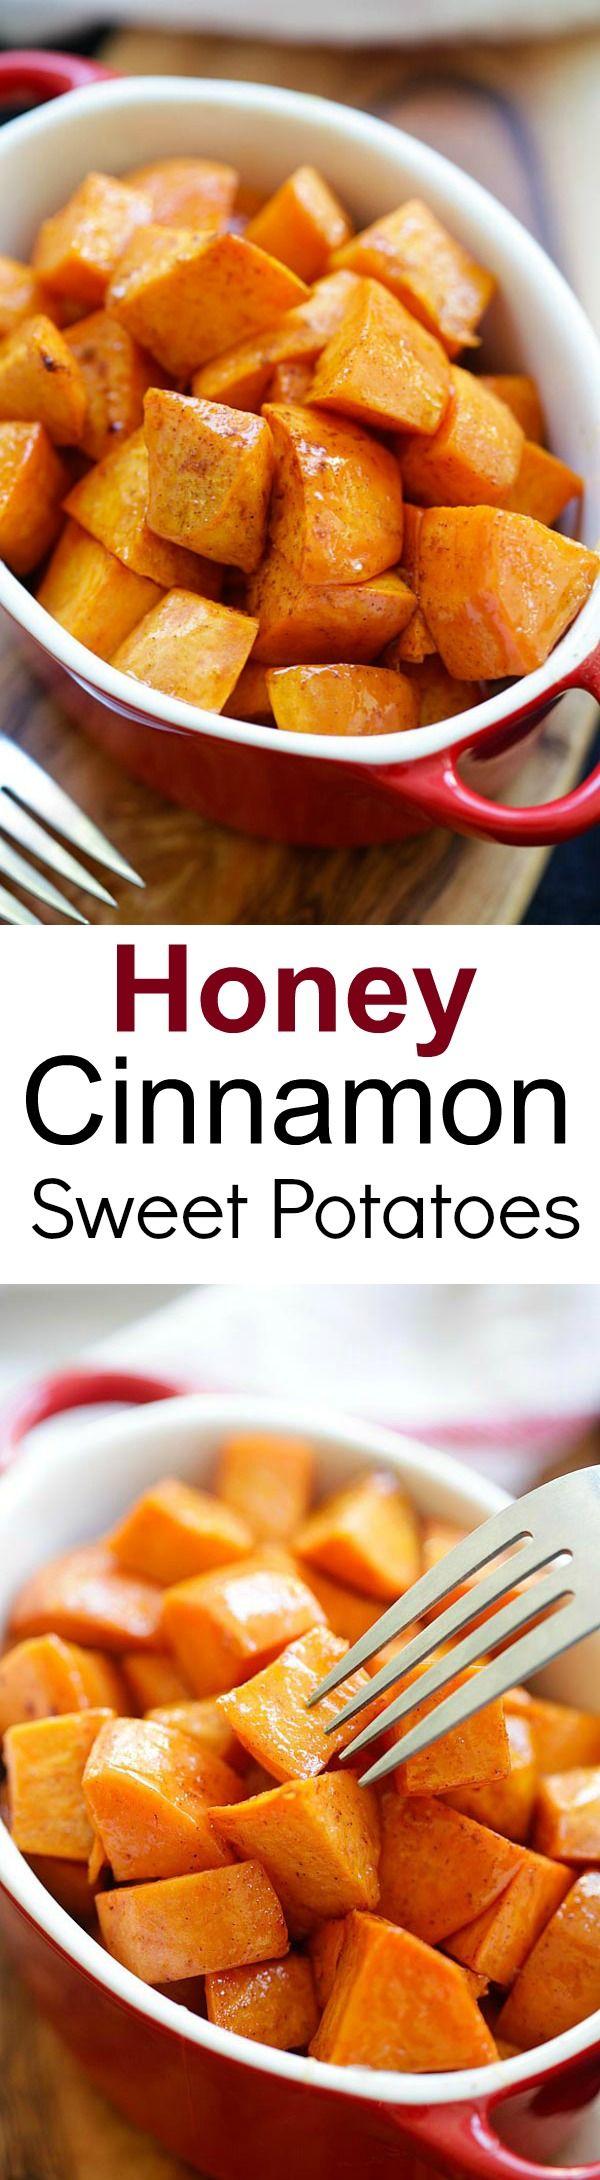 Honey Cinnamon Roasted Sweet Potatoes